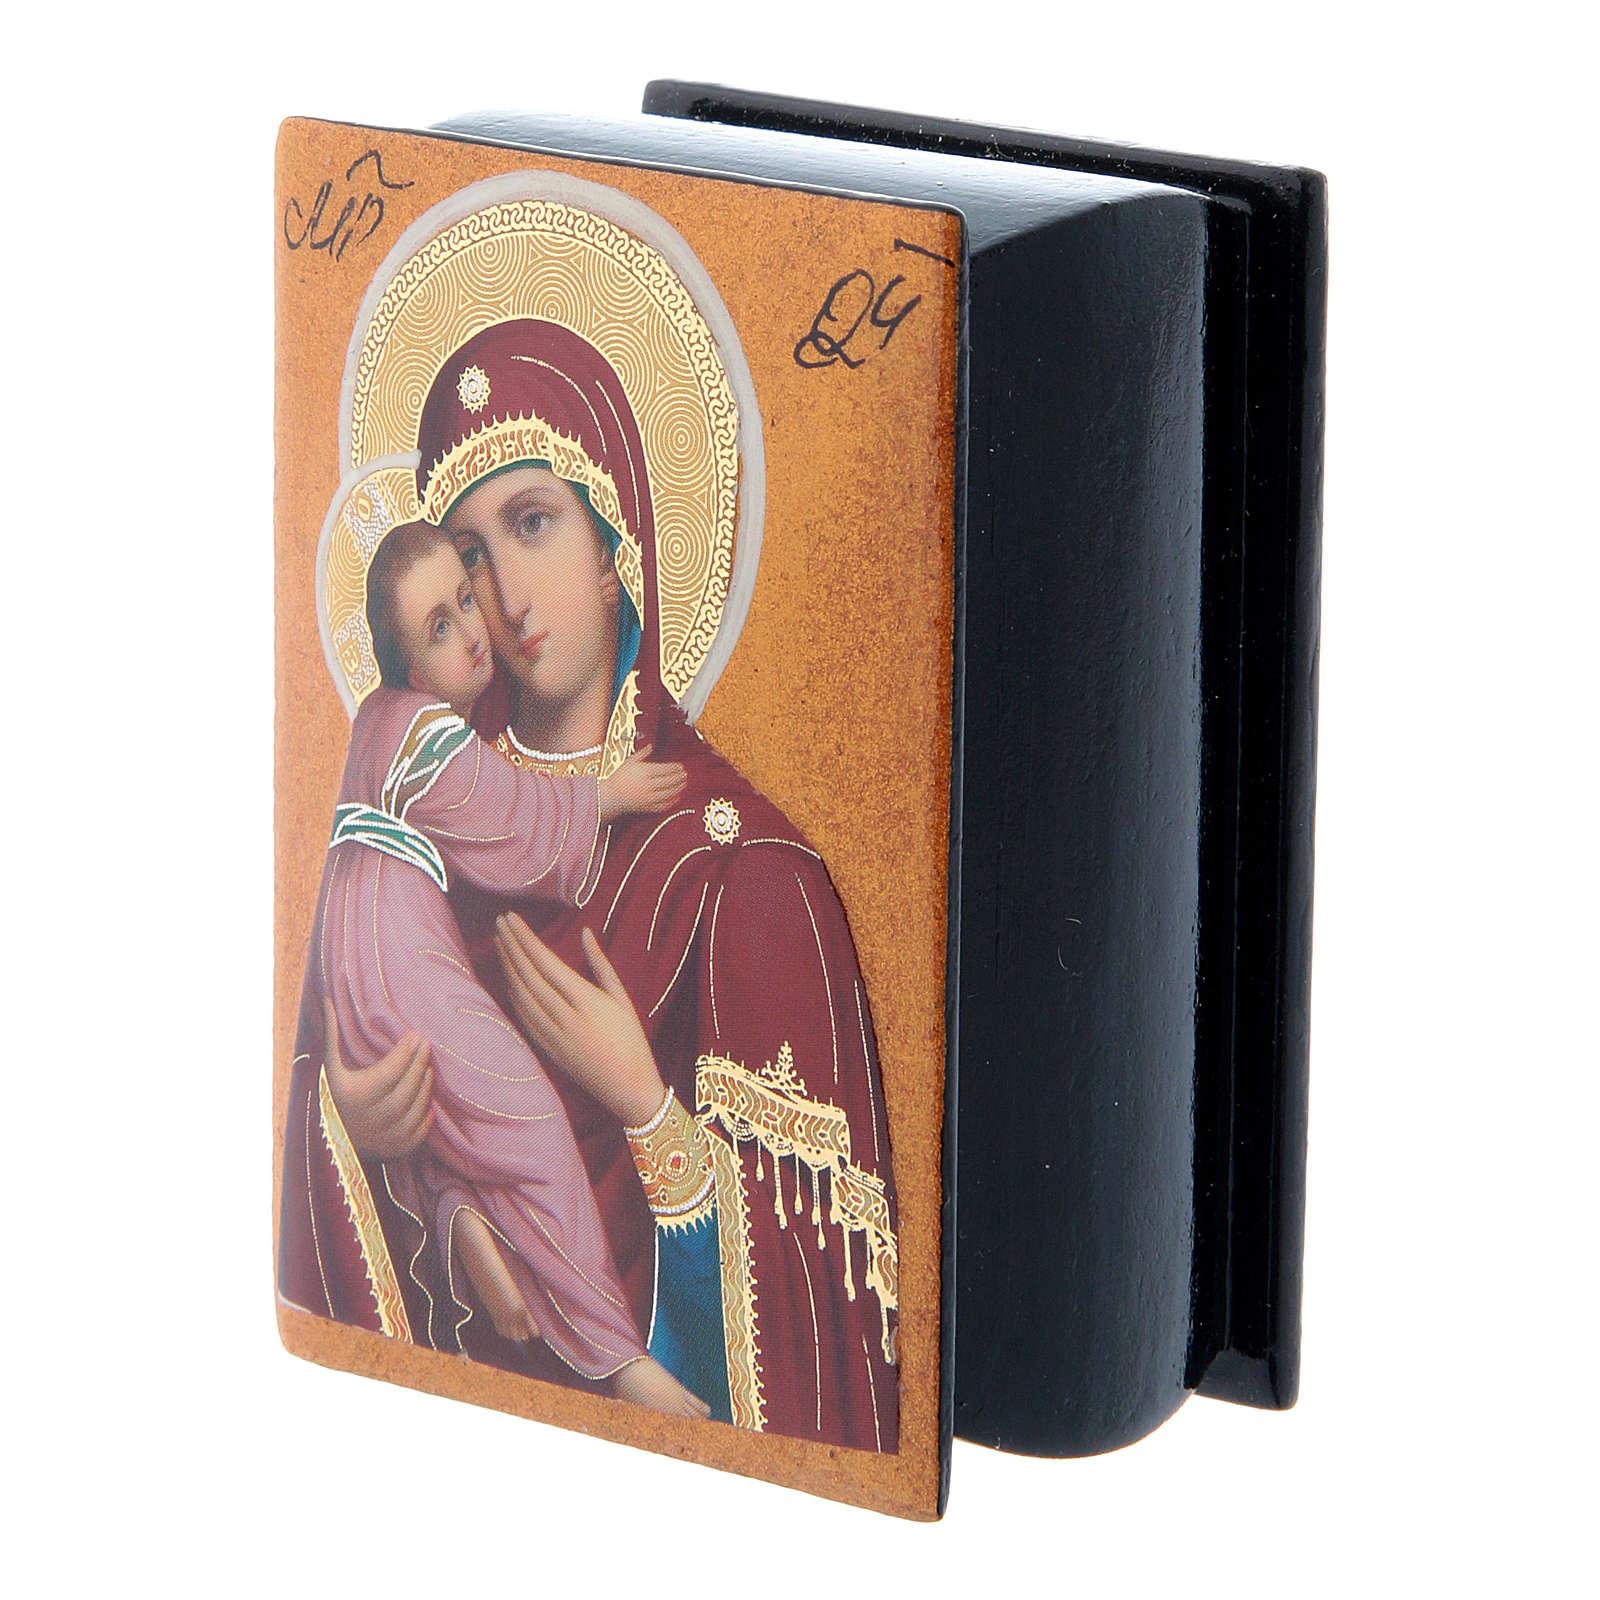 Scatola cartapesta papier machè russa Madonna Vladimirskaya 7X5 cm 4